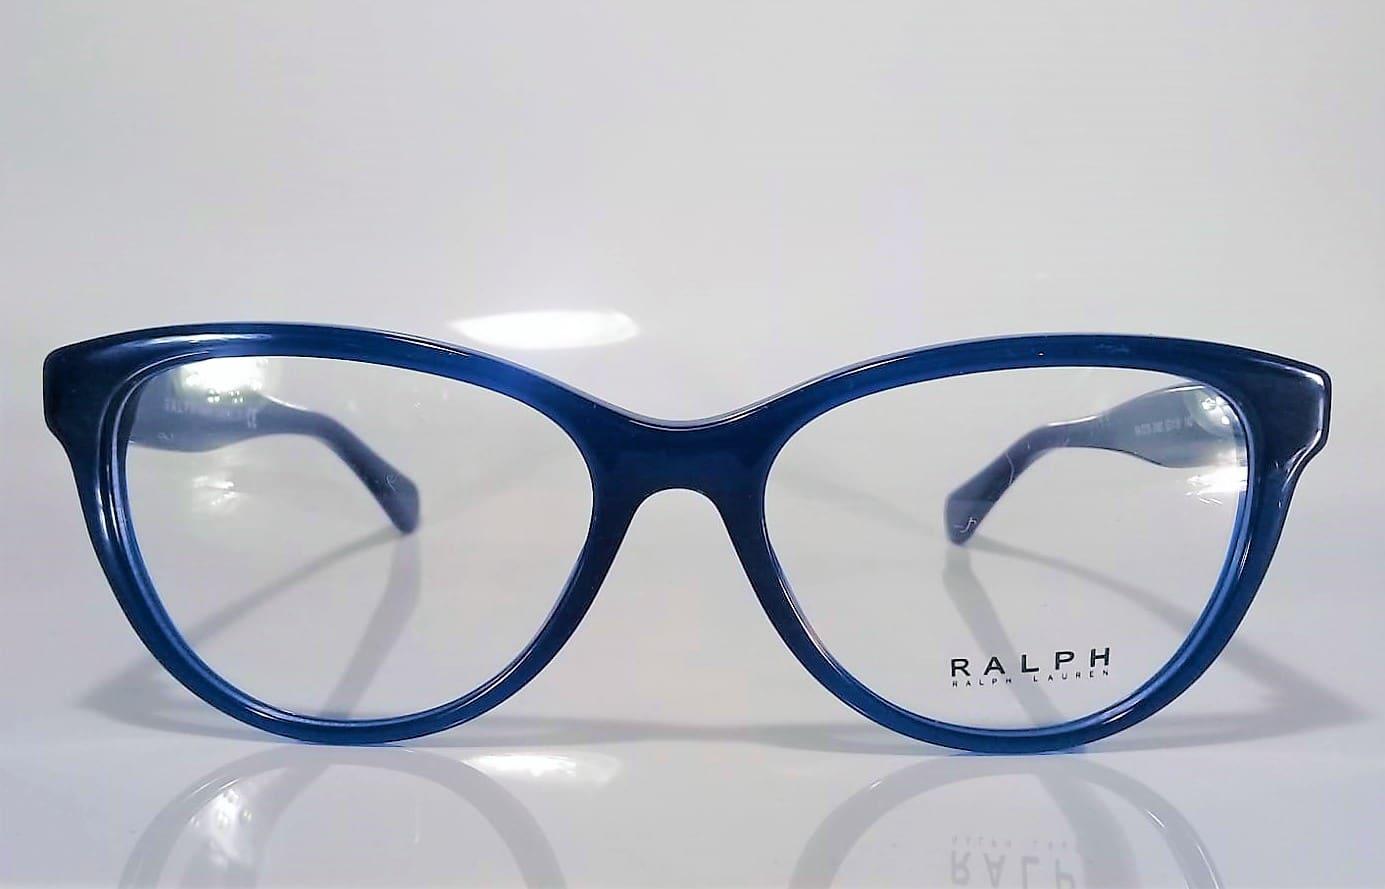 673cd26f58 Lentes de Receta Mujer Ralph 7075-3162 - Óptica Americana